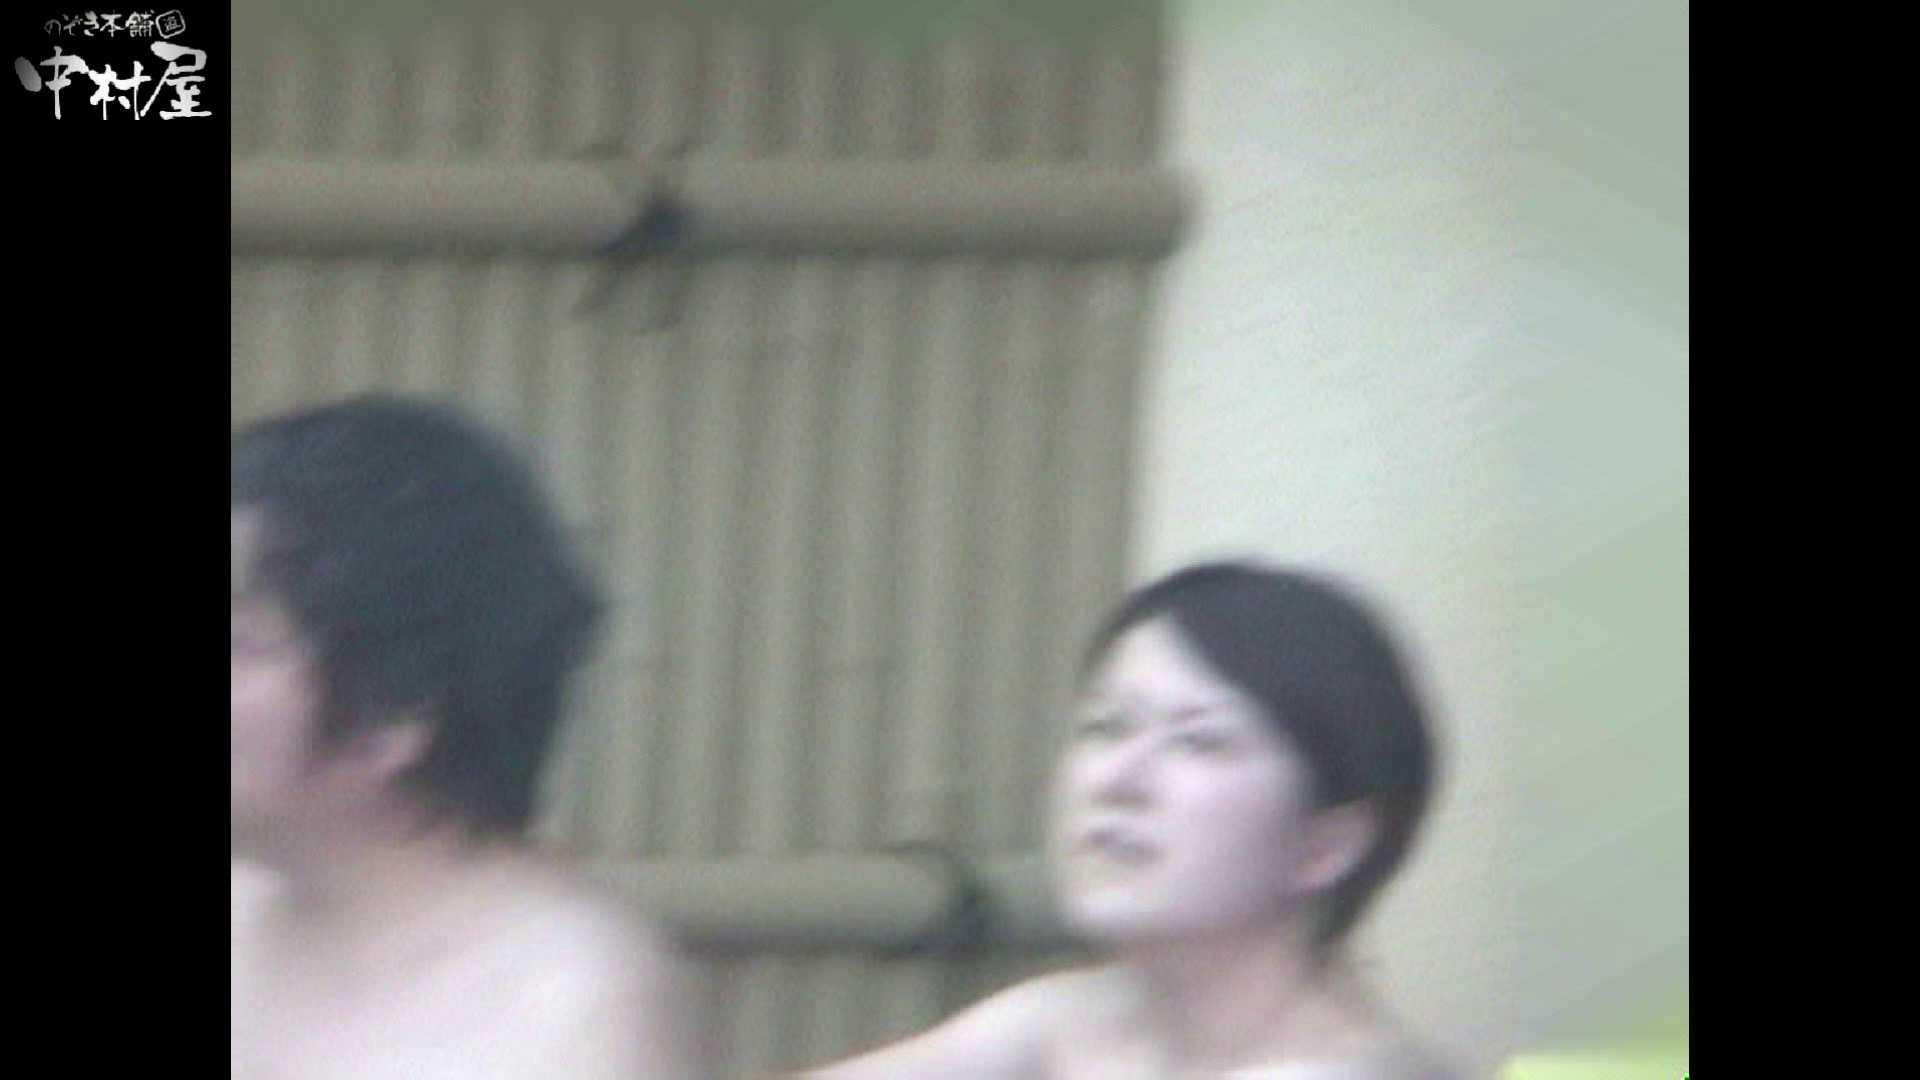 Aquaな露天風呂Vol.935 OLのエロ生活 性交動画流出 32連発 17